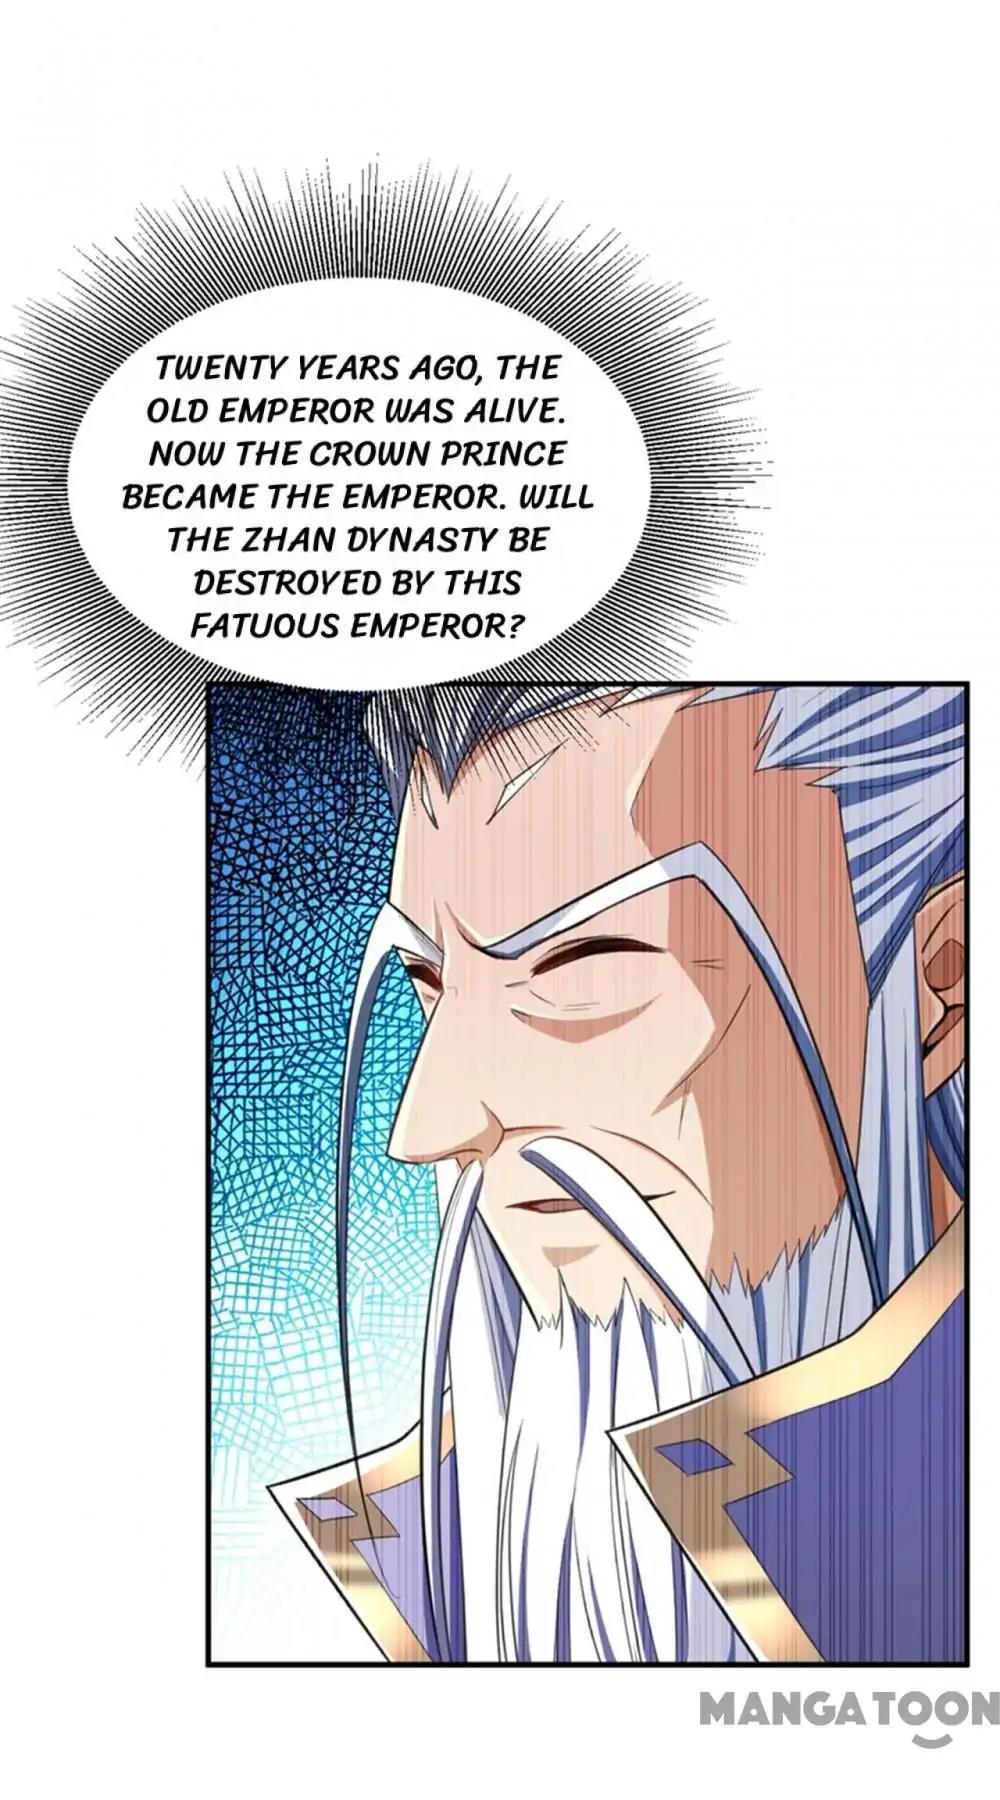 https://manga.mangadogs.com/comics/pic2/41/24169/1132787/3dbf996cda195acfa83b7f12ca698ae0.jpg Page 1